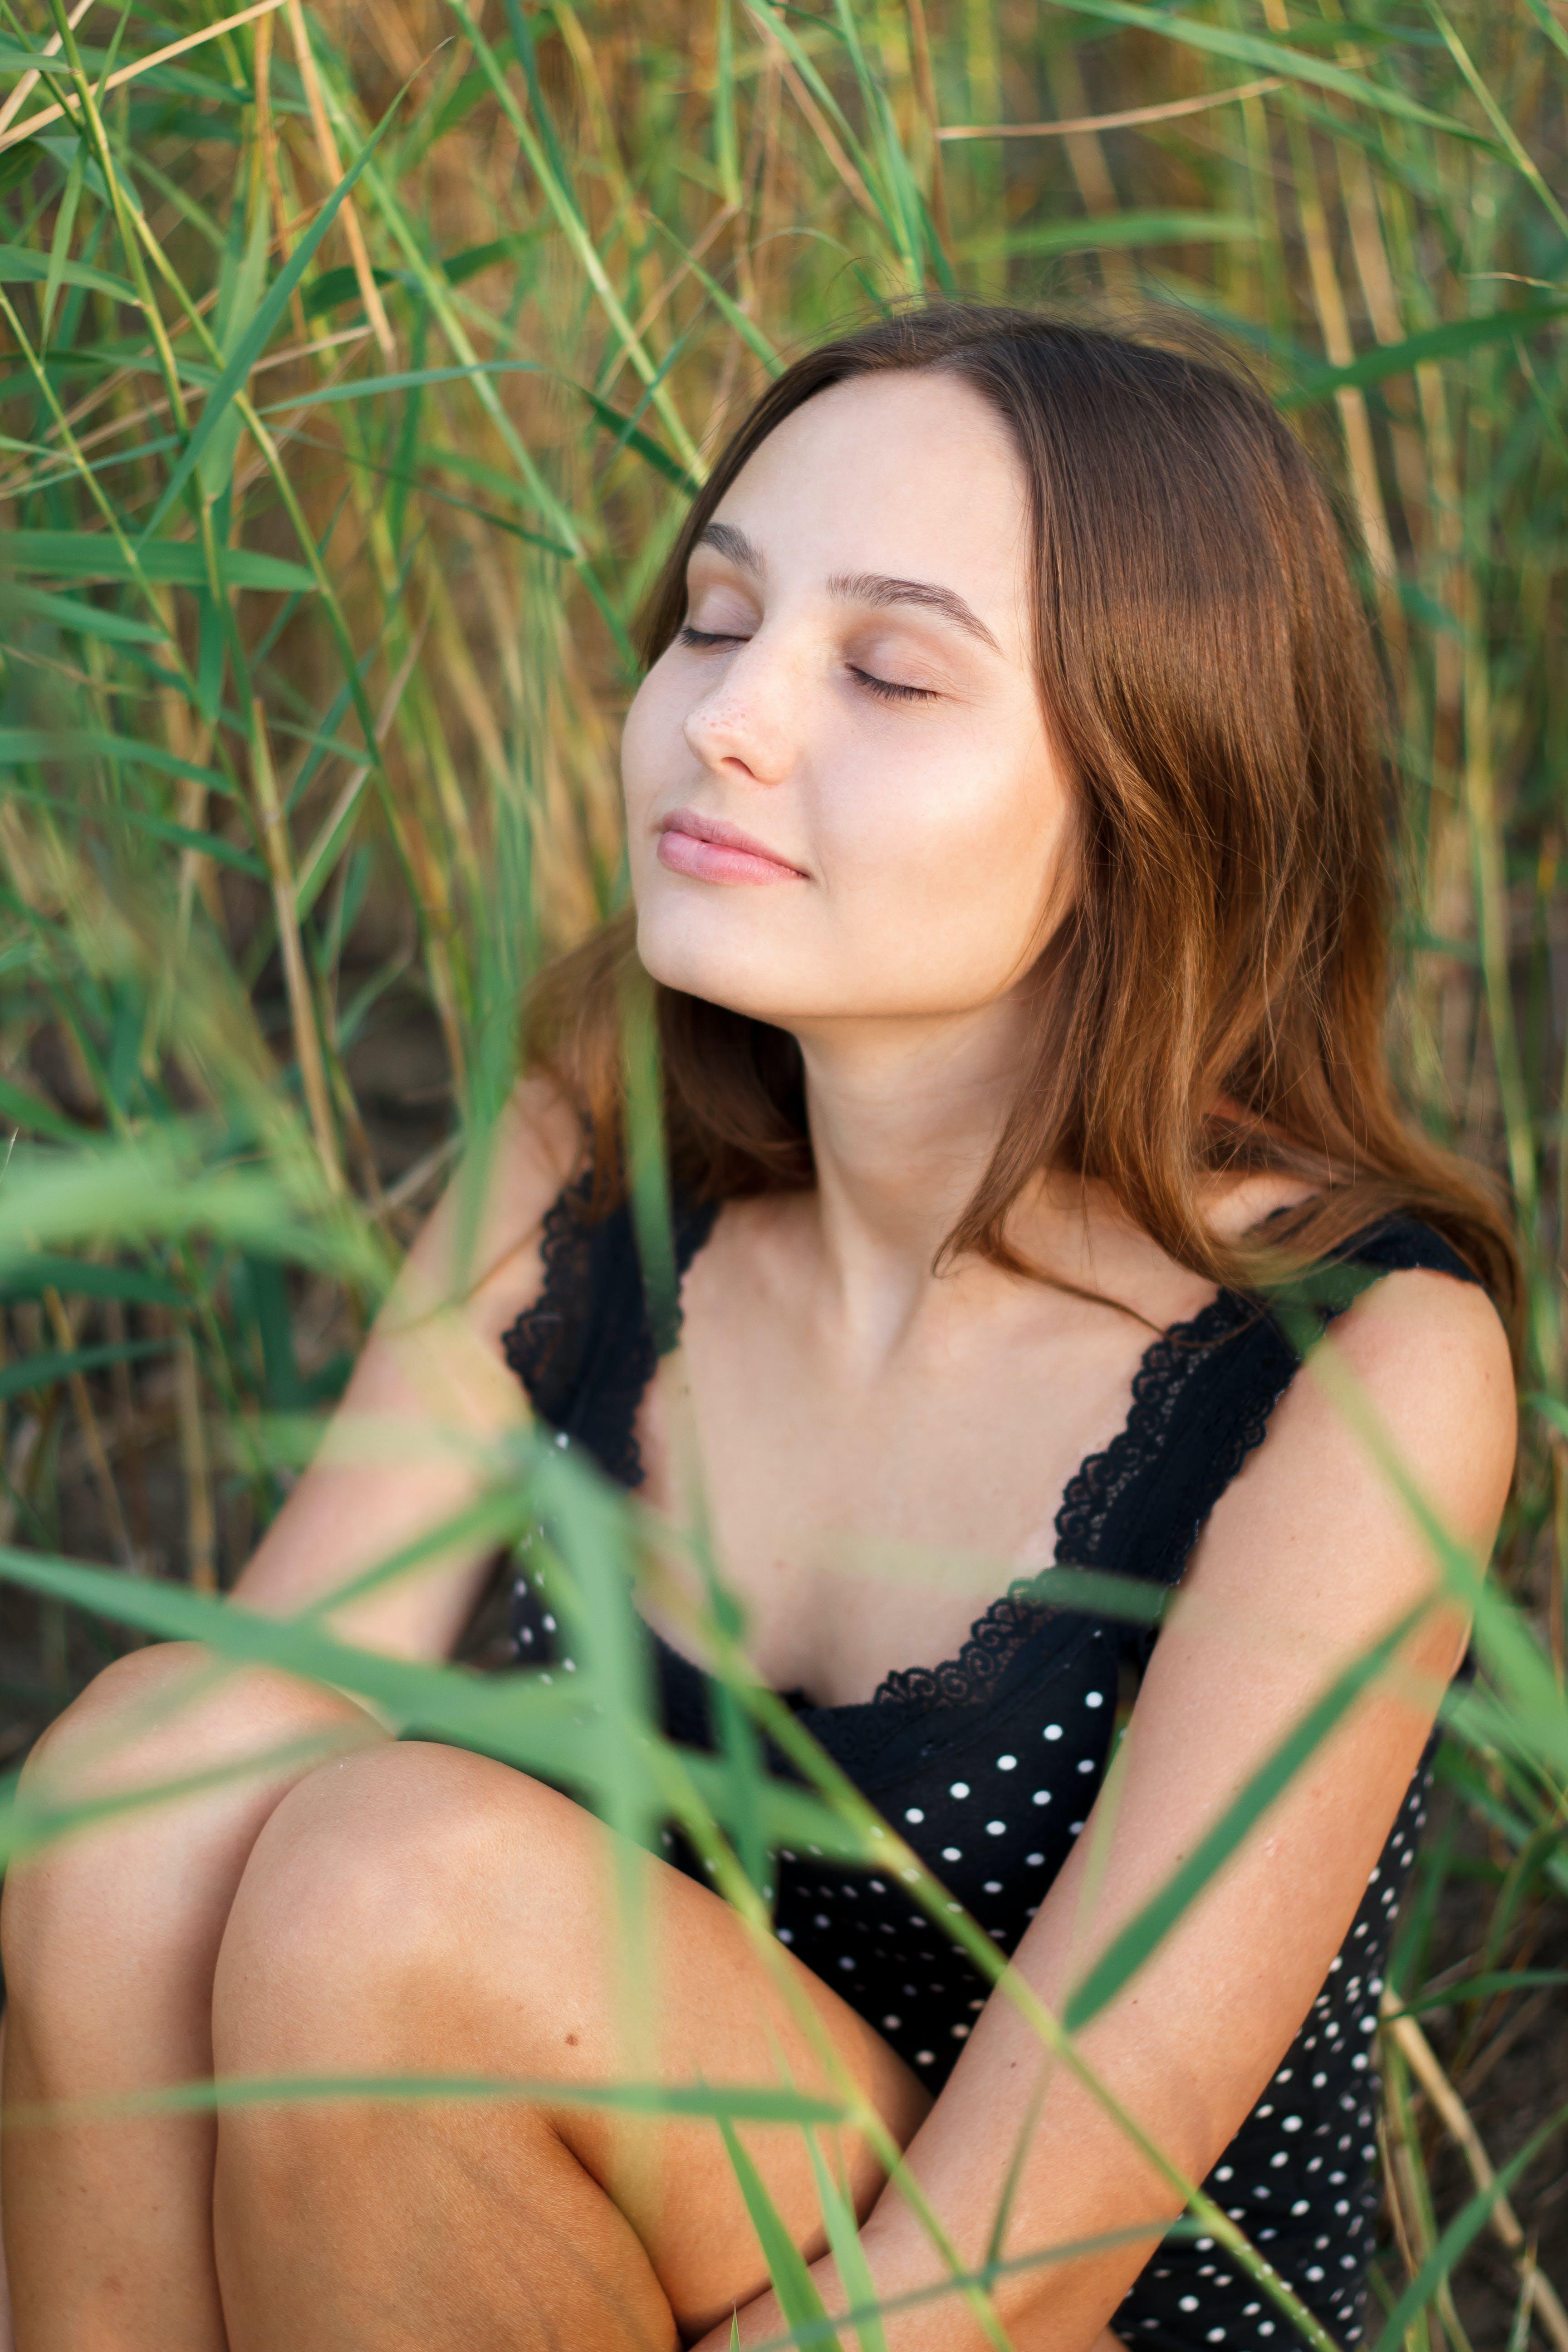 Kostenloses Stock Foto zu frau, entspannung, sitzen, model